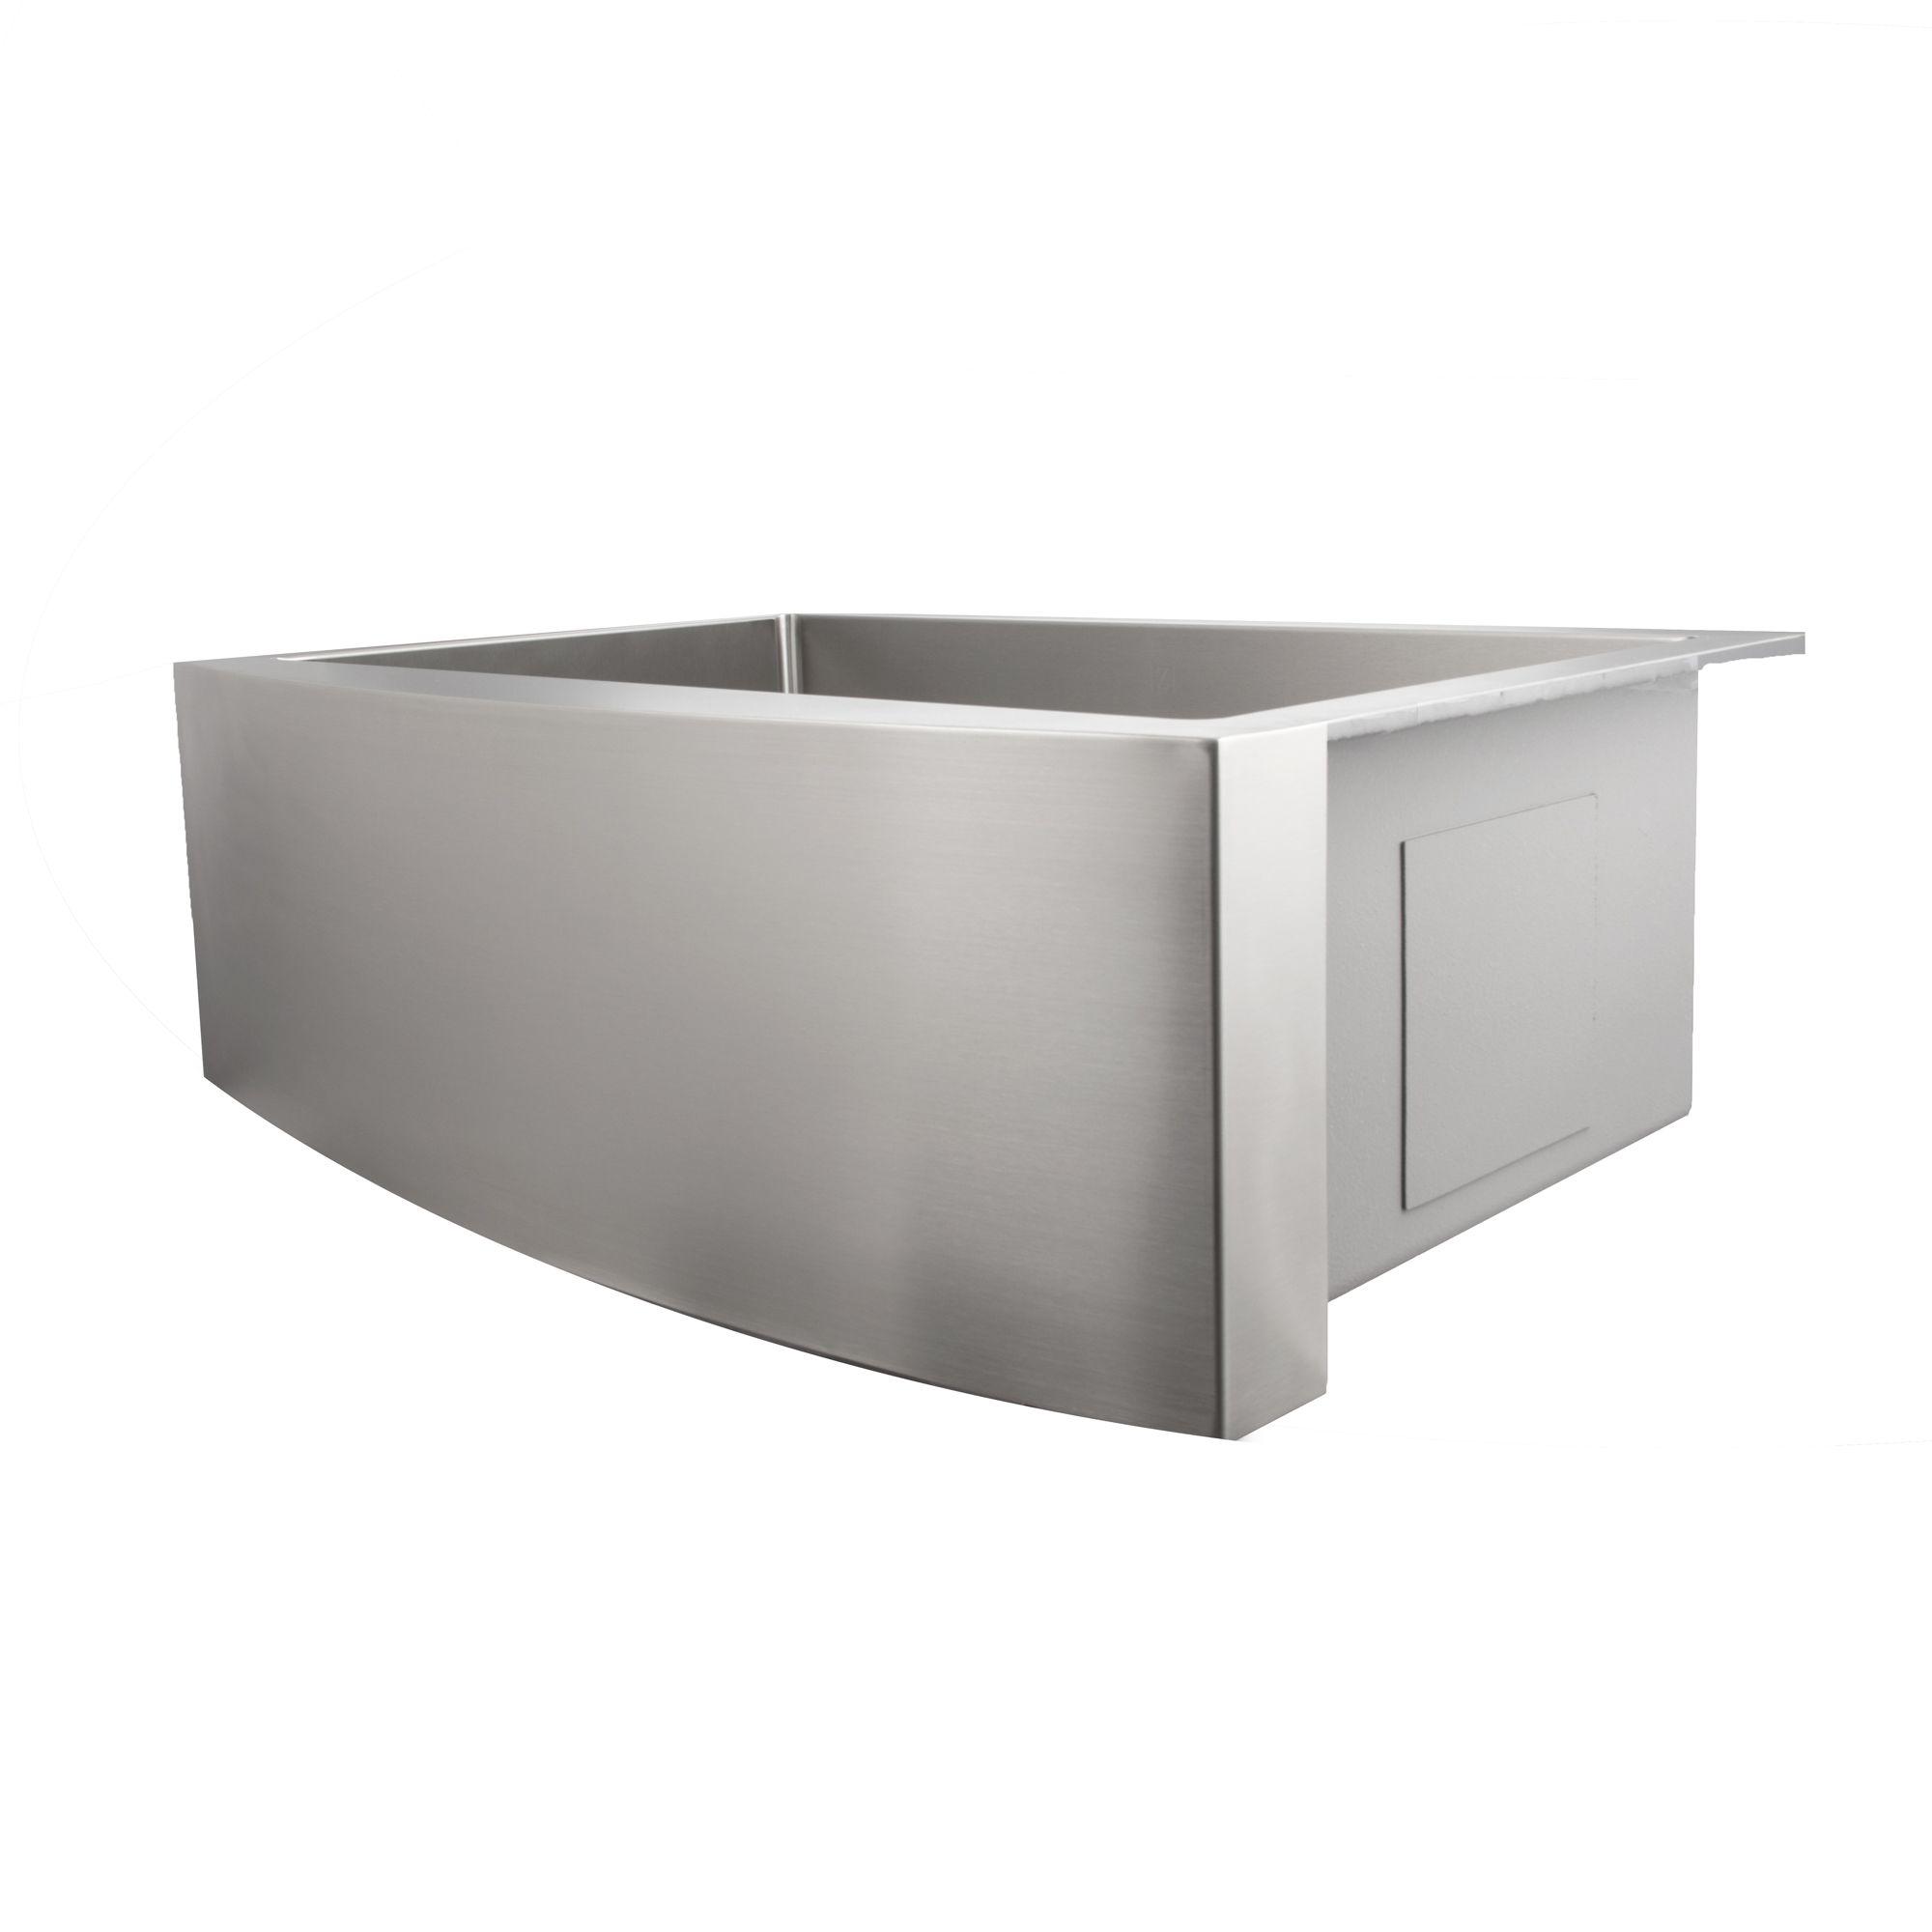 Zline Farmhouse Series 30 Inch Undermount Single Bowl Apron Sink In Stainless Steel Sas 30 Apron Sink Sink Kitchen And Bath